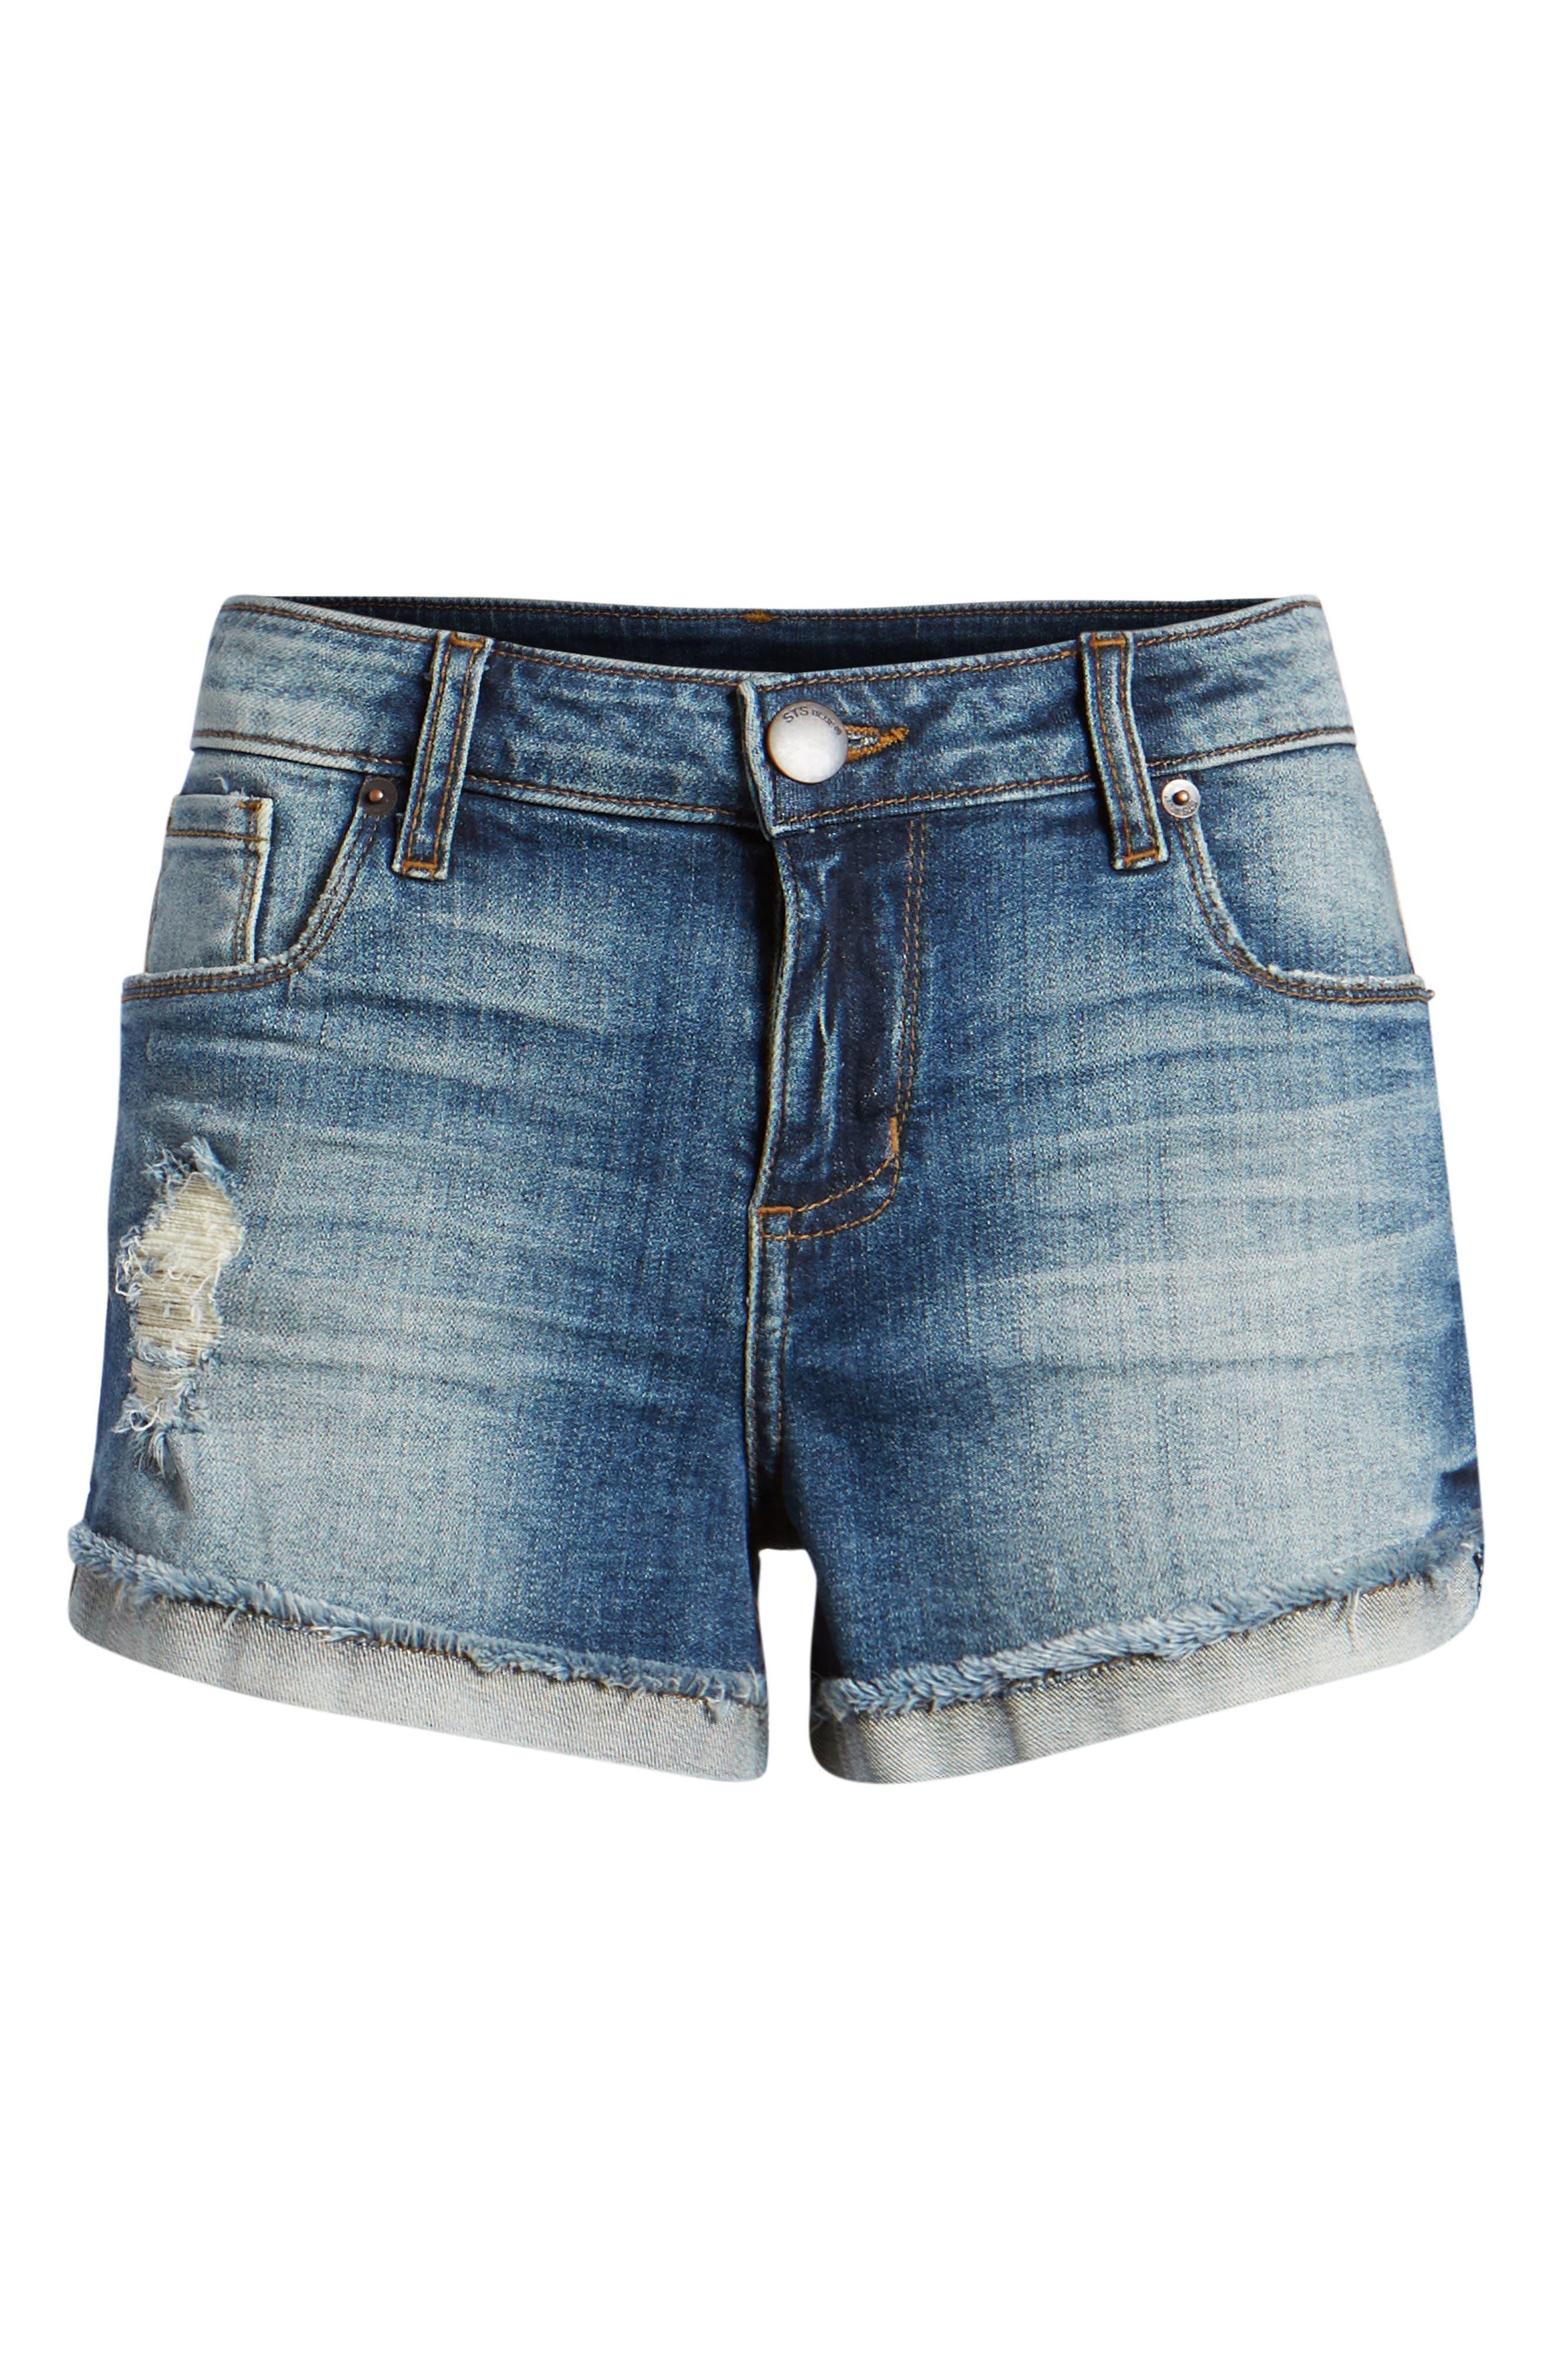 Boyfriend Denim Shorts,                             Alternate thumbnail 7, color,                             400